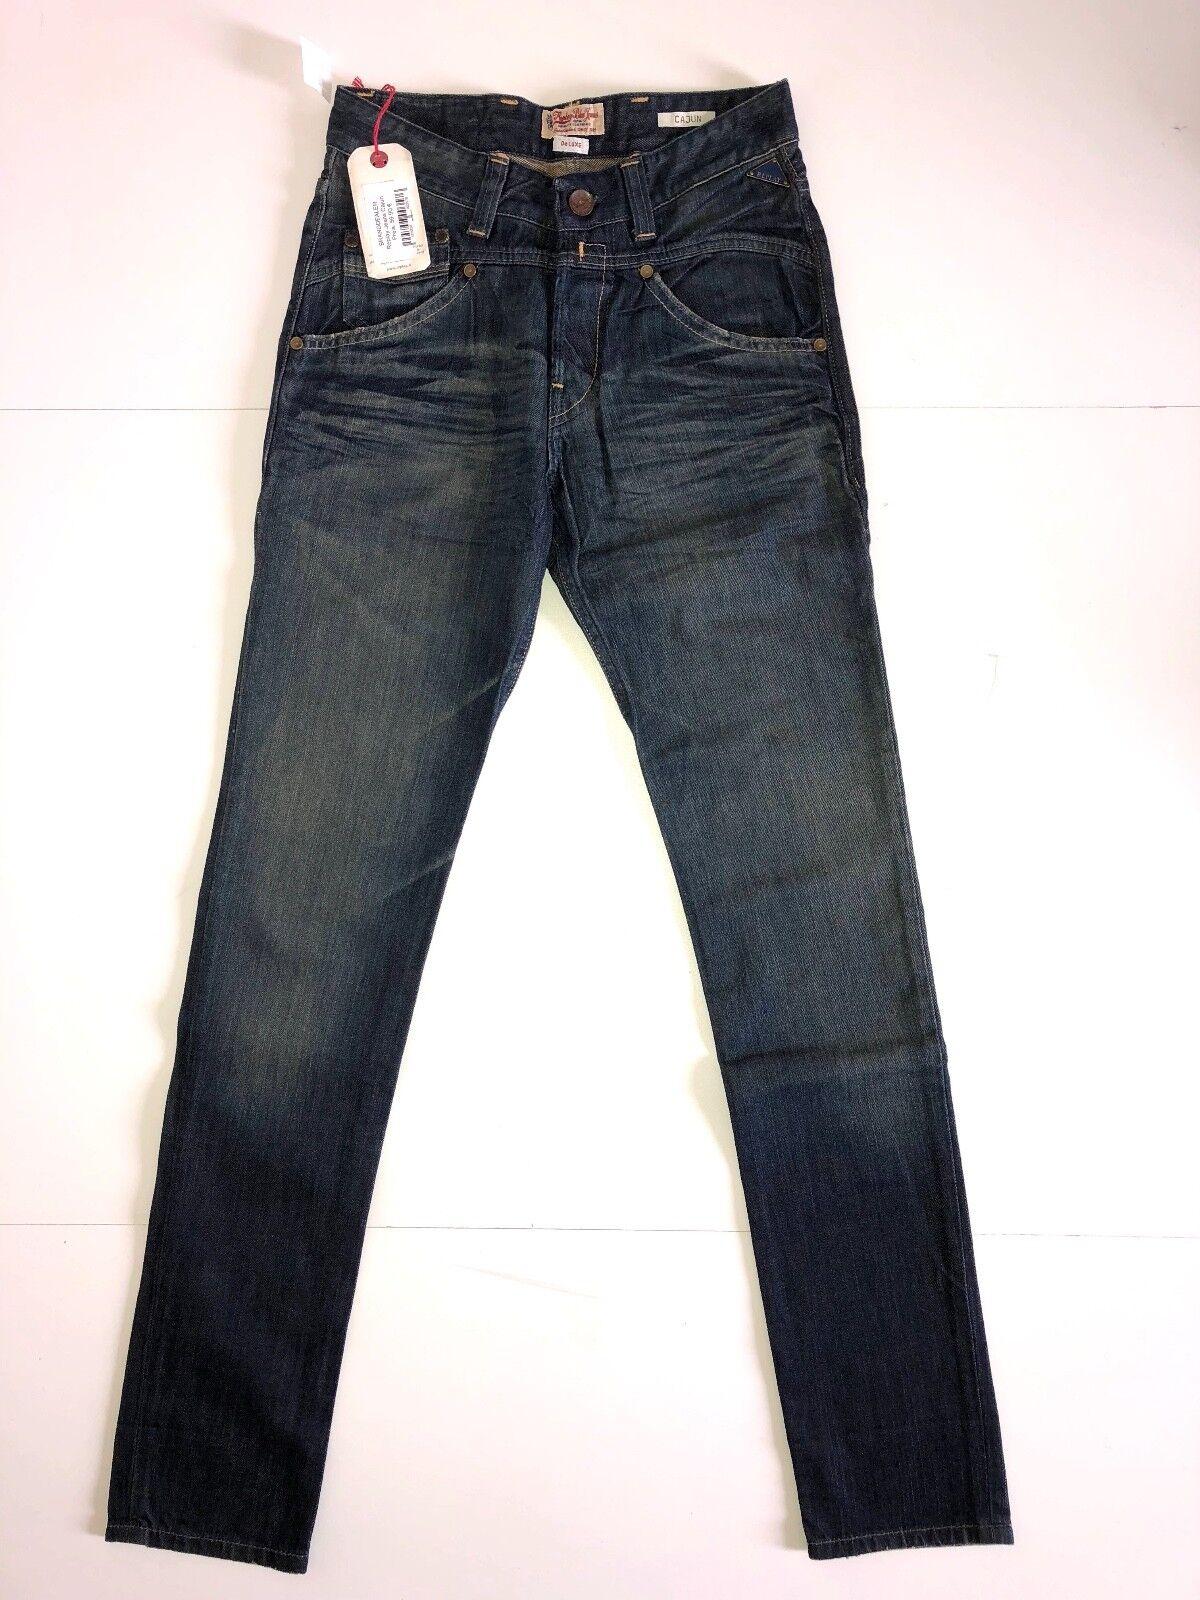 ️ Replay bluee Jeans  ️ Jeans Hose CAJUN  ️ Gr. 25 32  ️